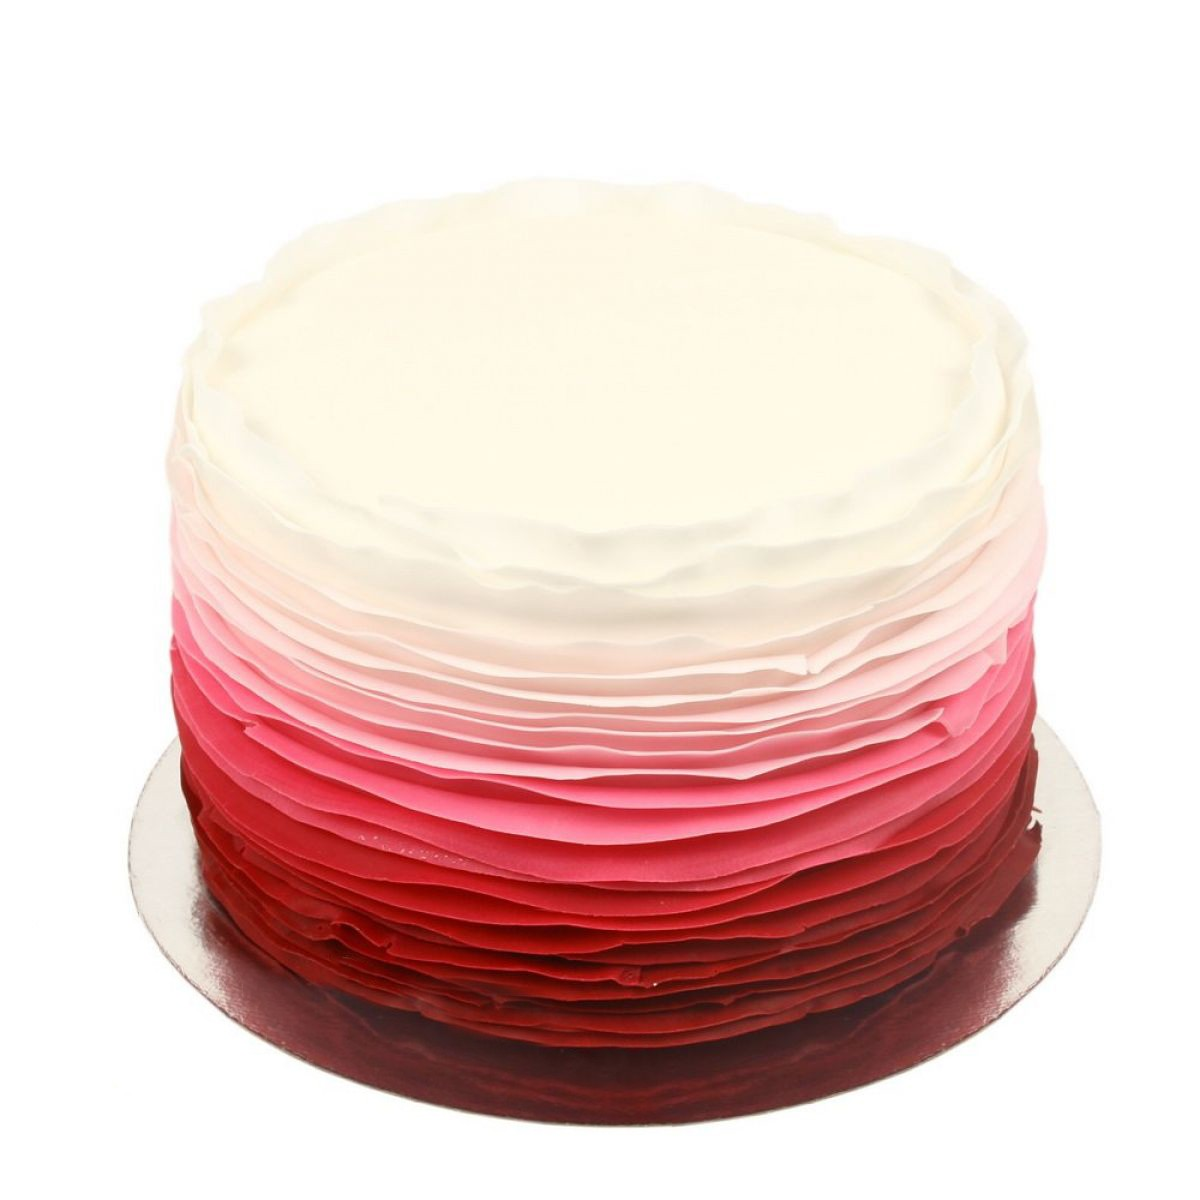 №1184 Торт омбре